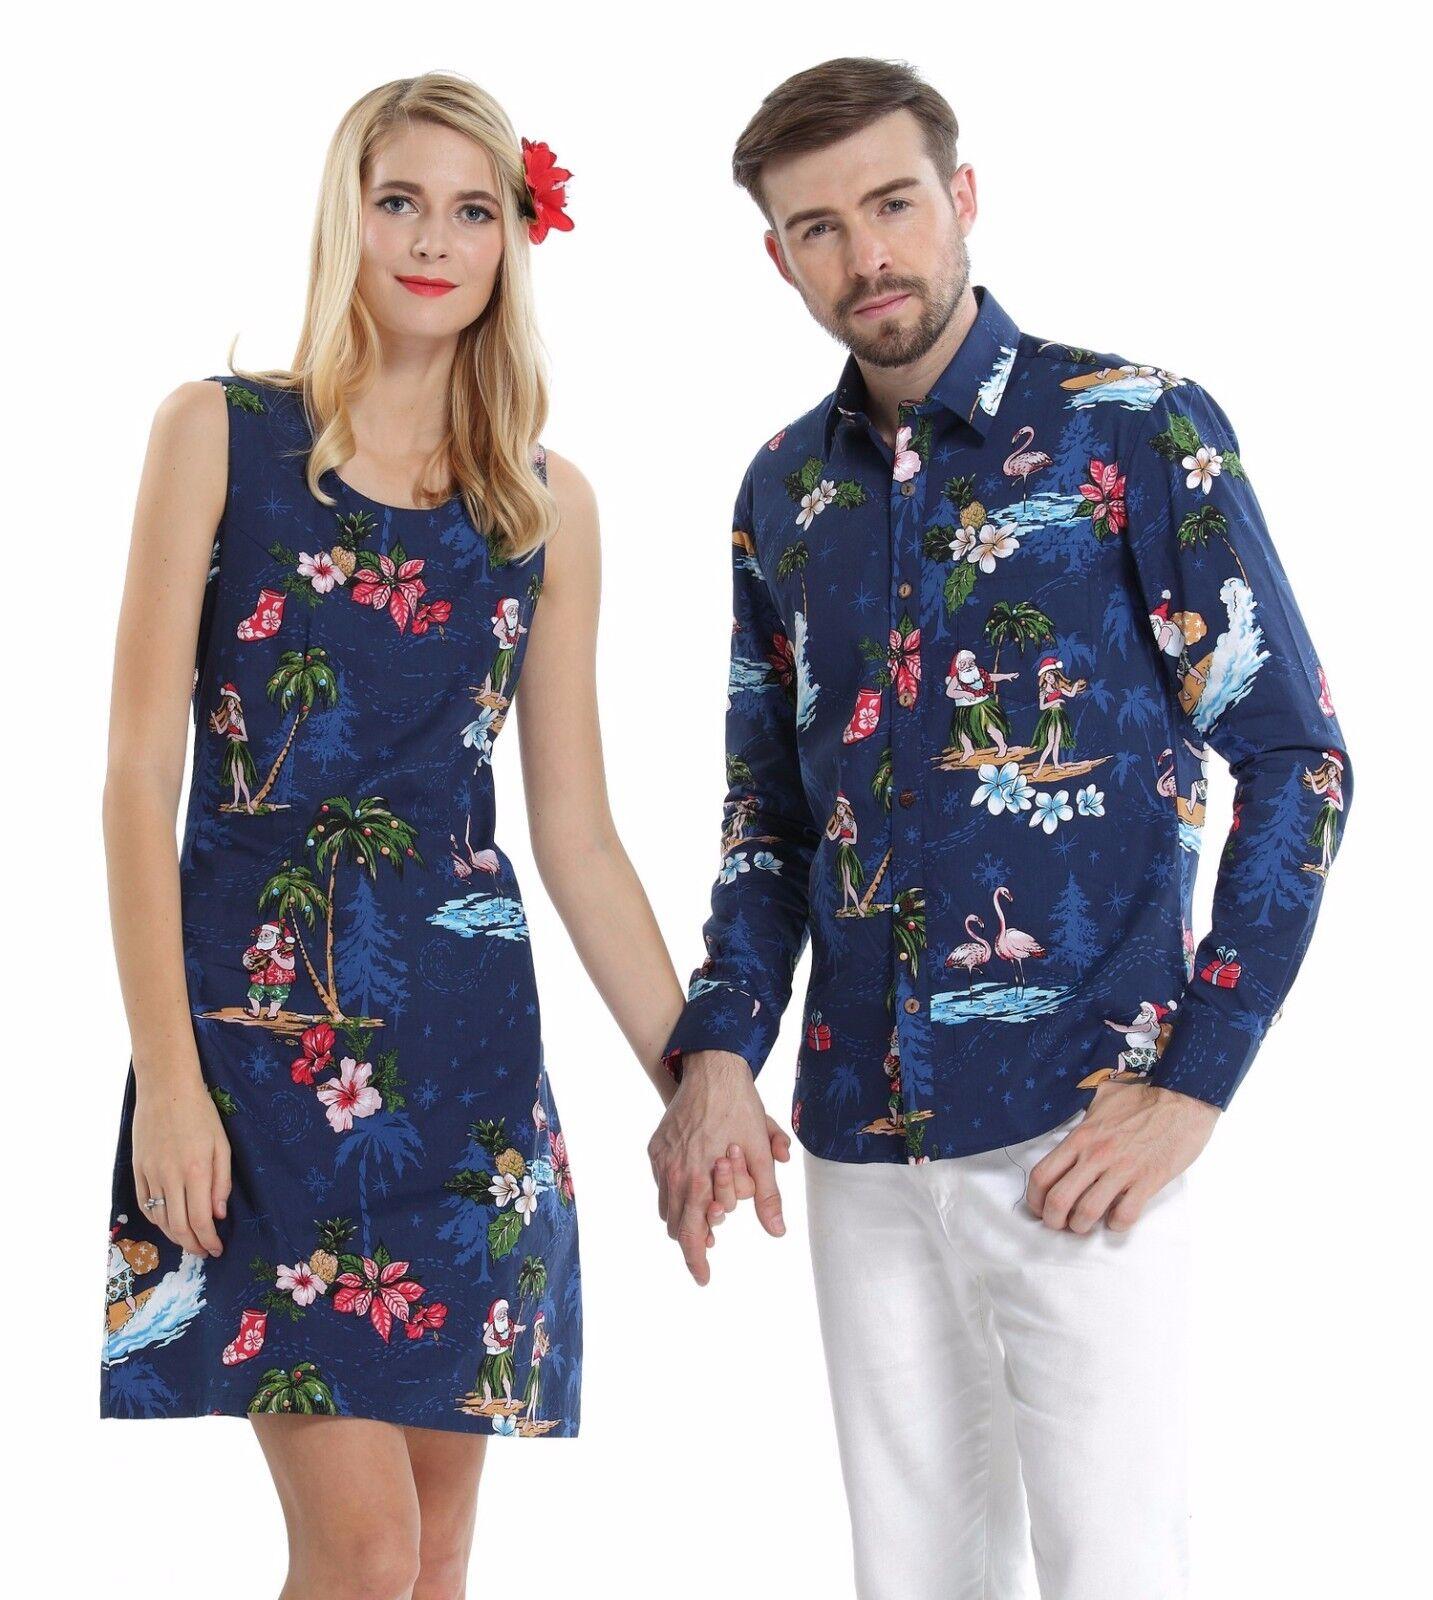 Christmas Santa Couple Matching Dress Long Sleeve Shirts ...